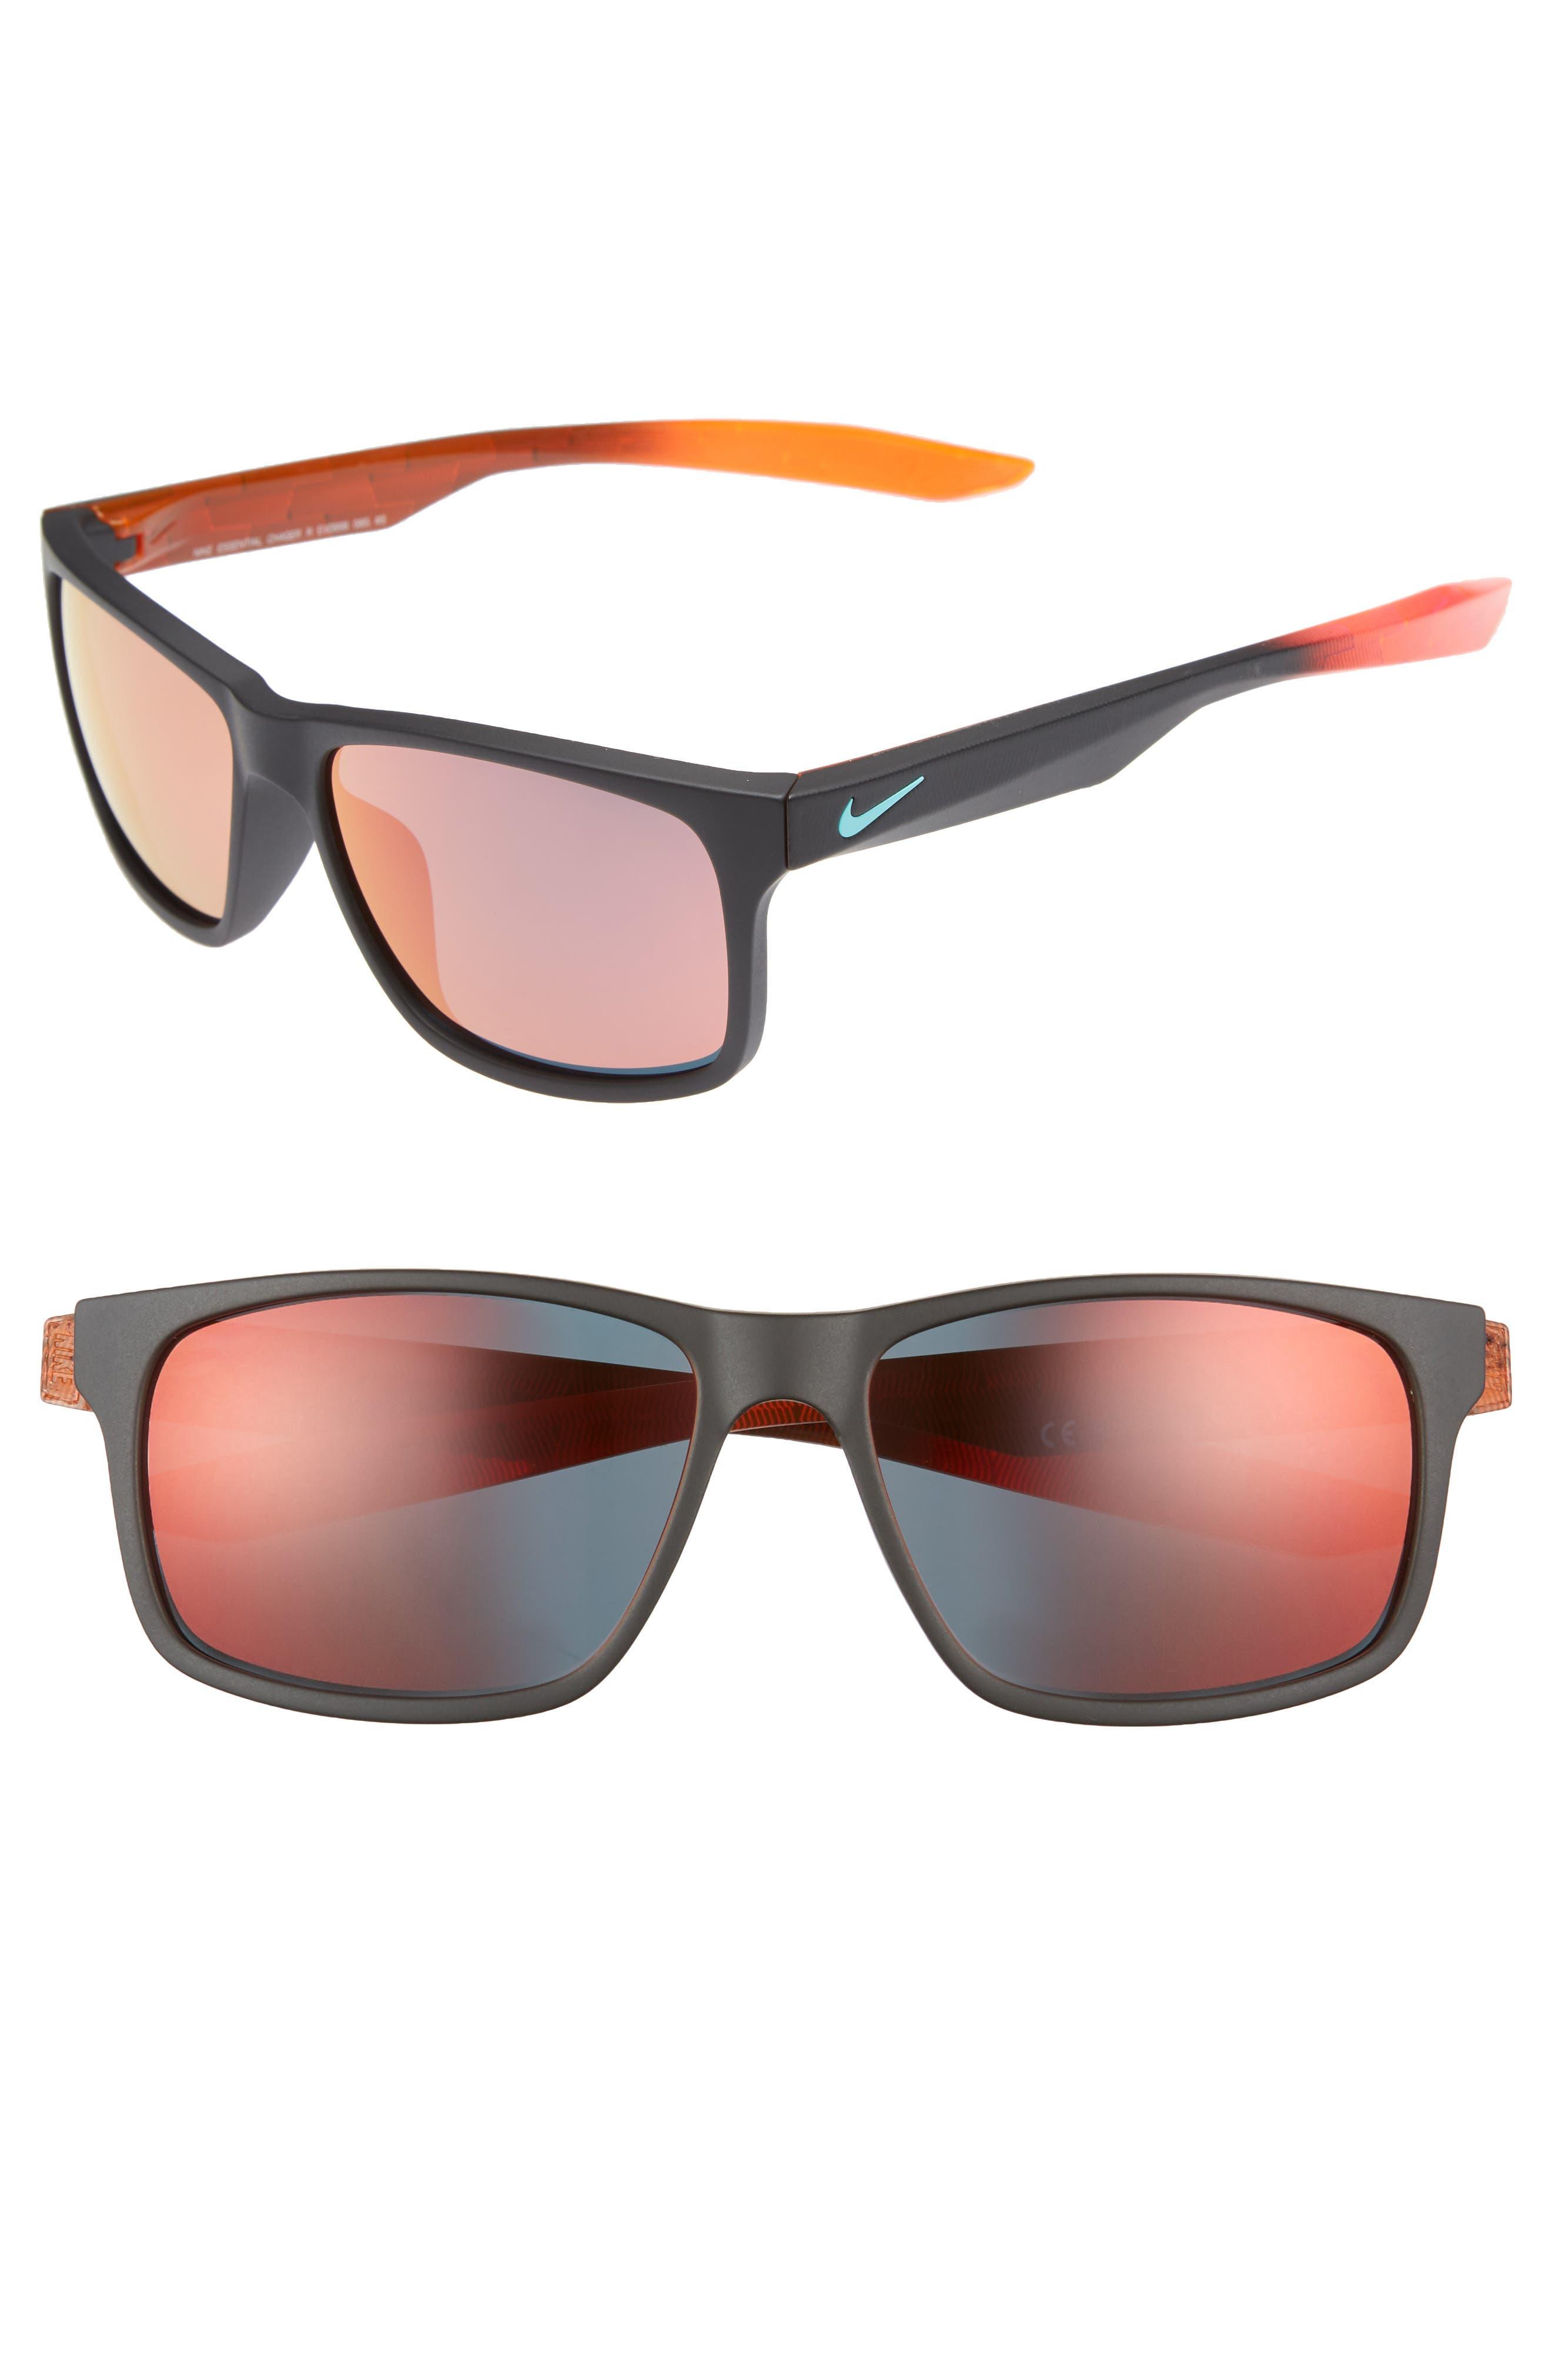 Essential Chaser 57mm Reflective Sunglasses,                             Main thumbnail 1, color,                             Matte Black/ Amaranthine